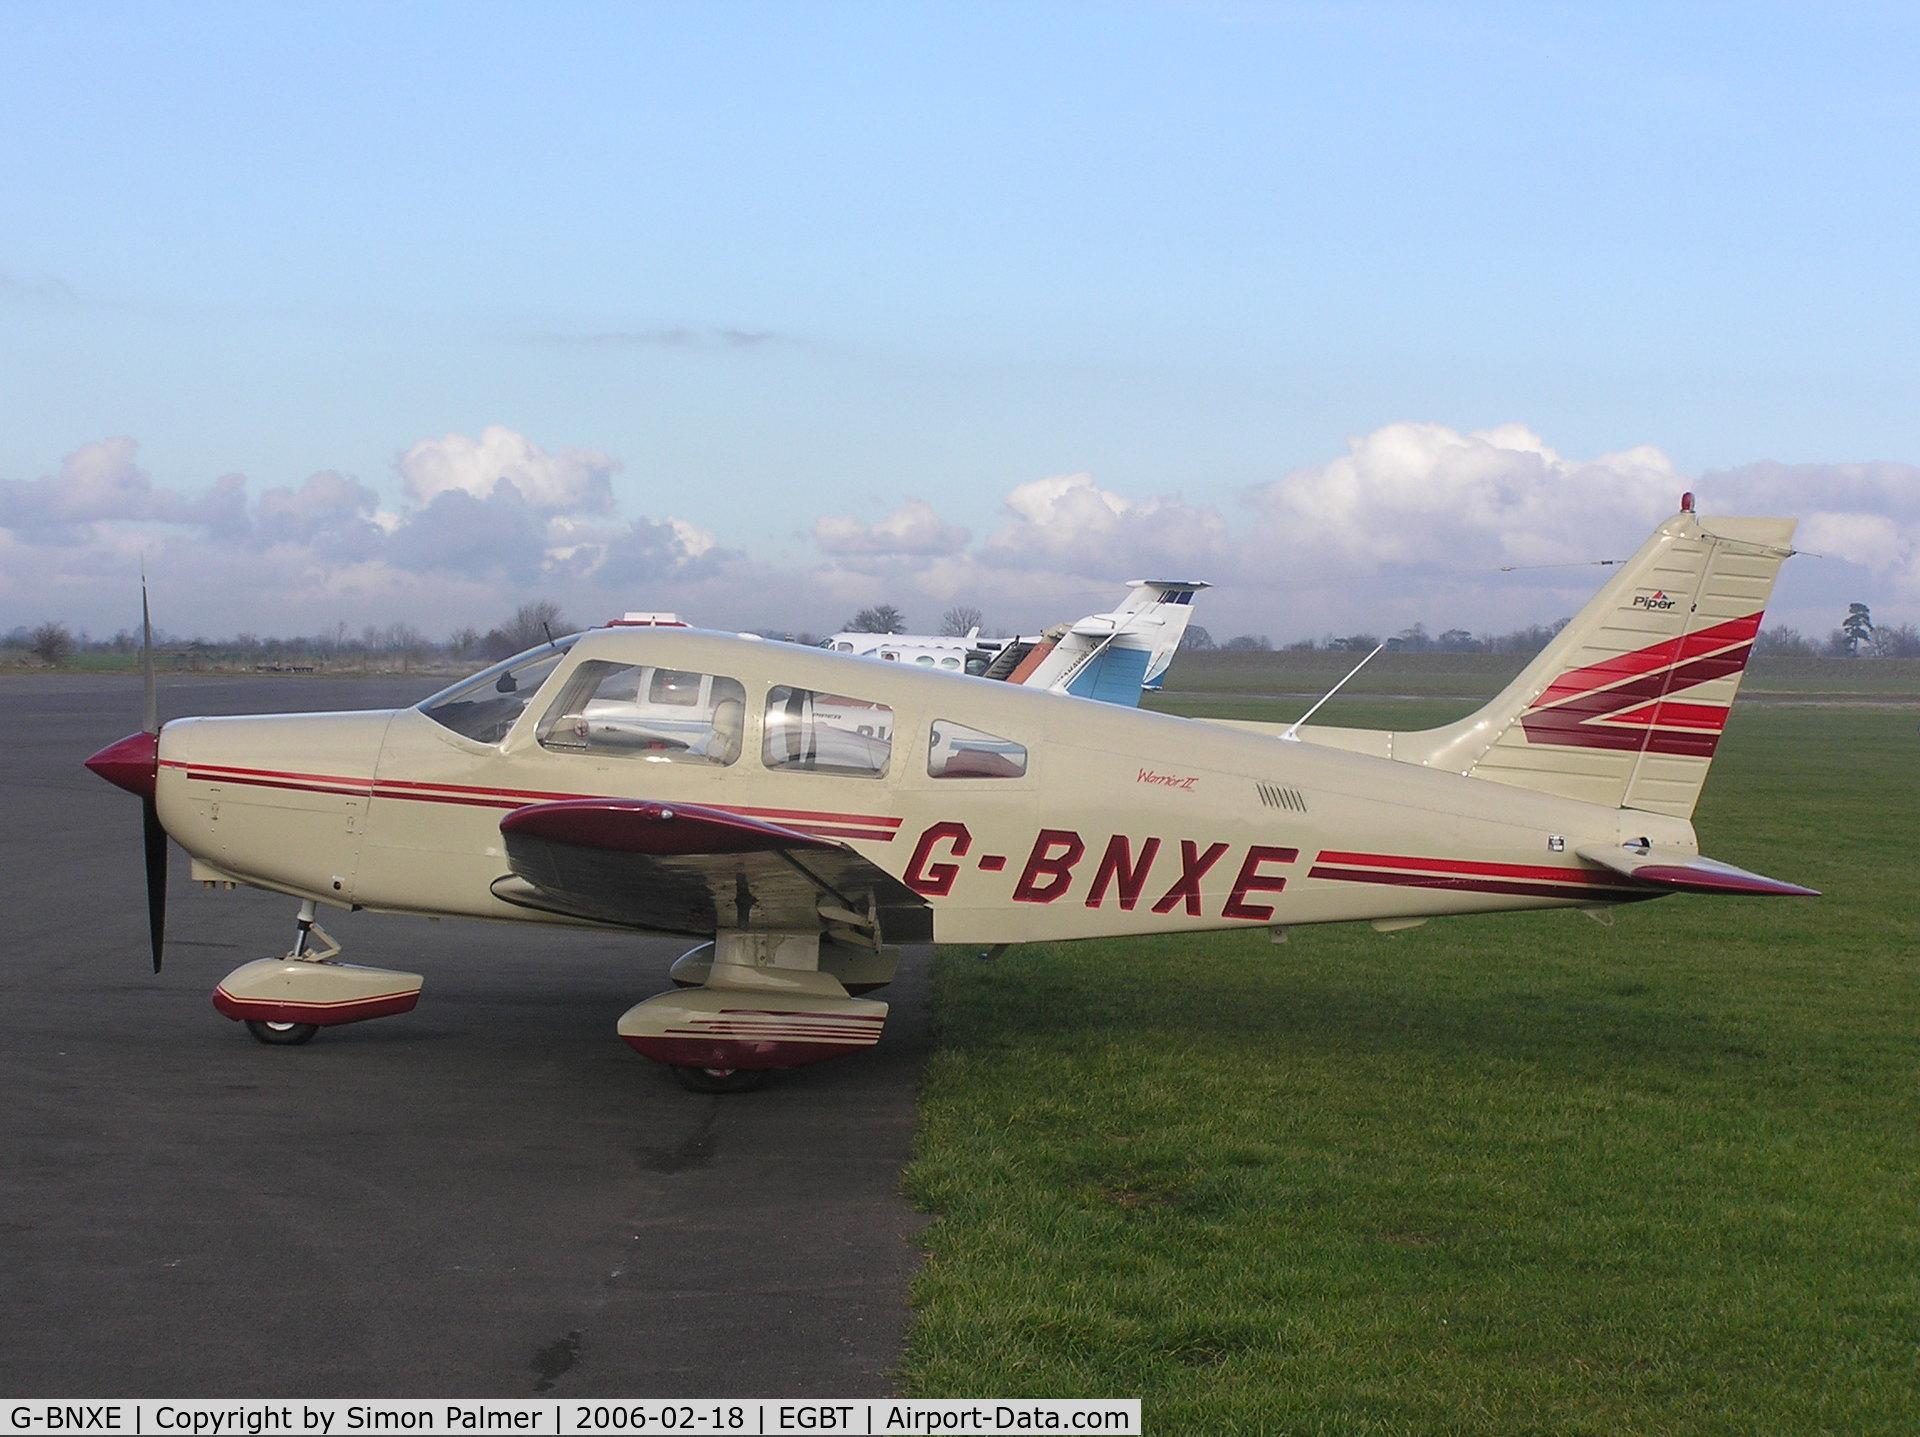 G-BNXE, 1981 Piper PA-28-161 C/N 28-8116034, PA28 at Turweston